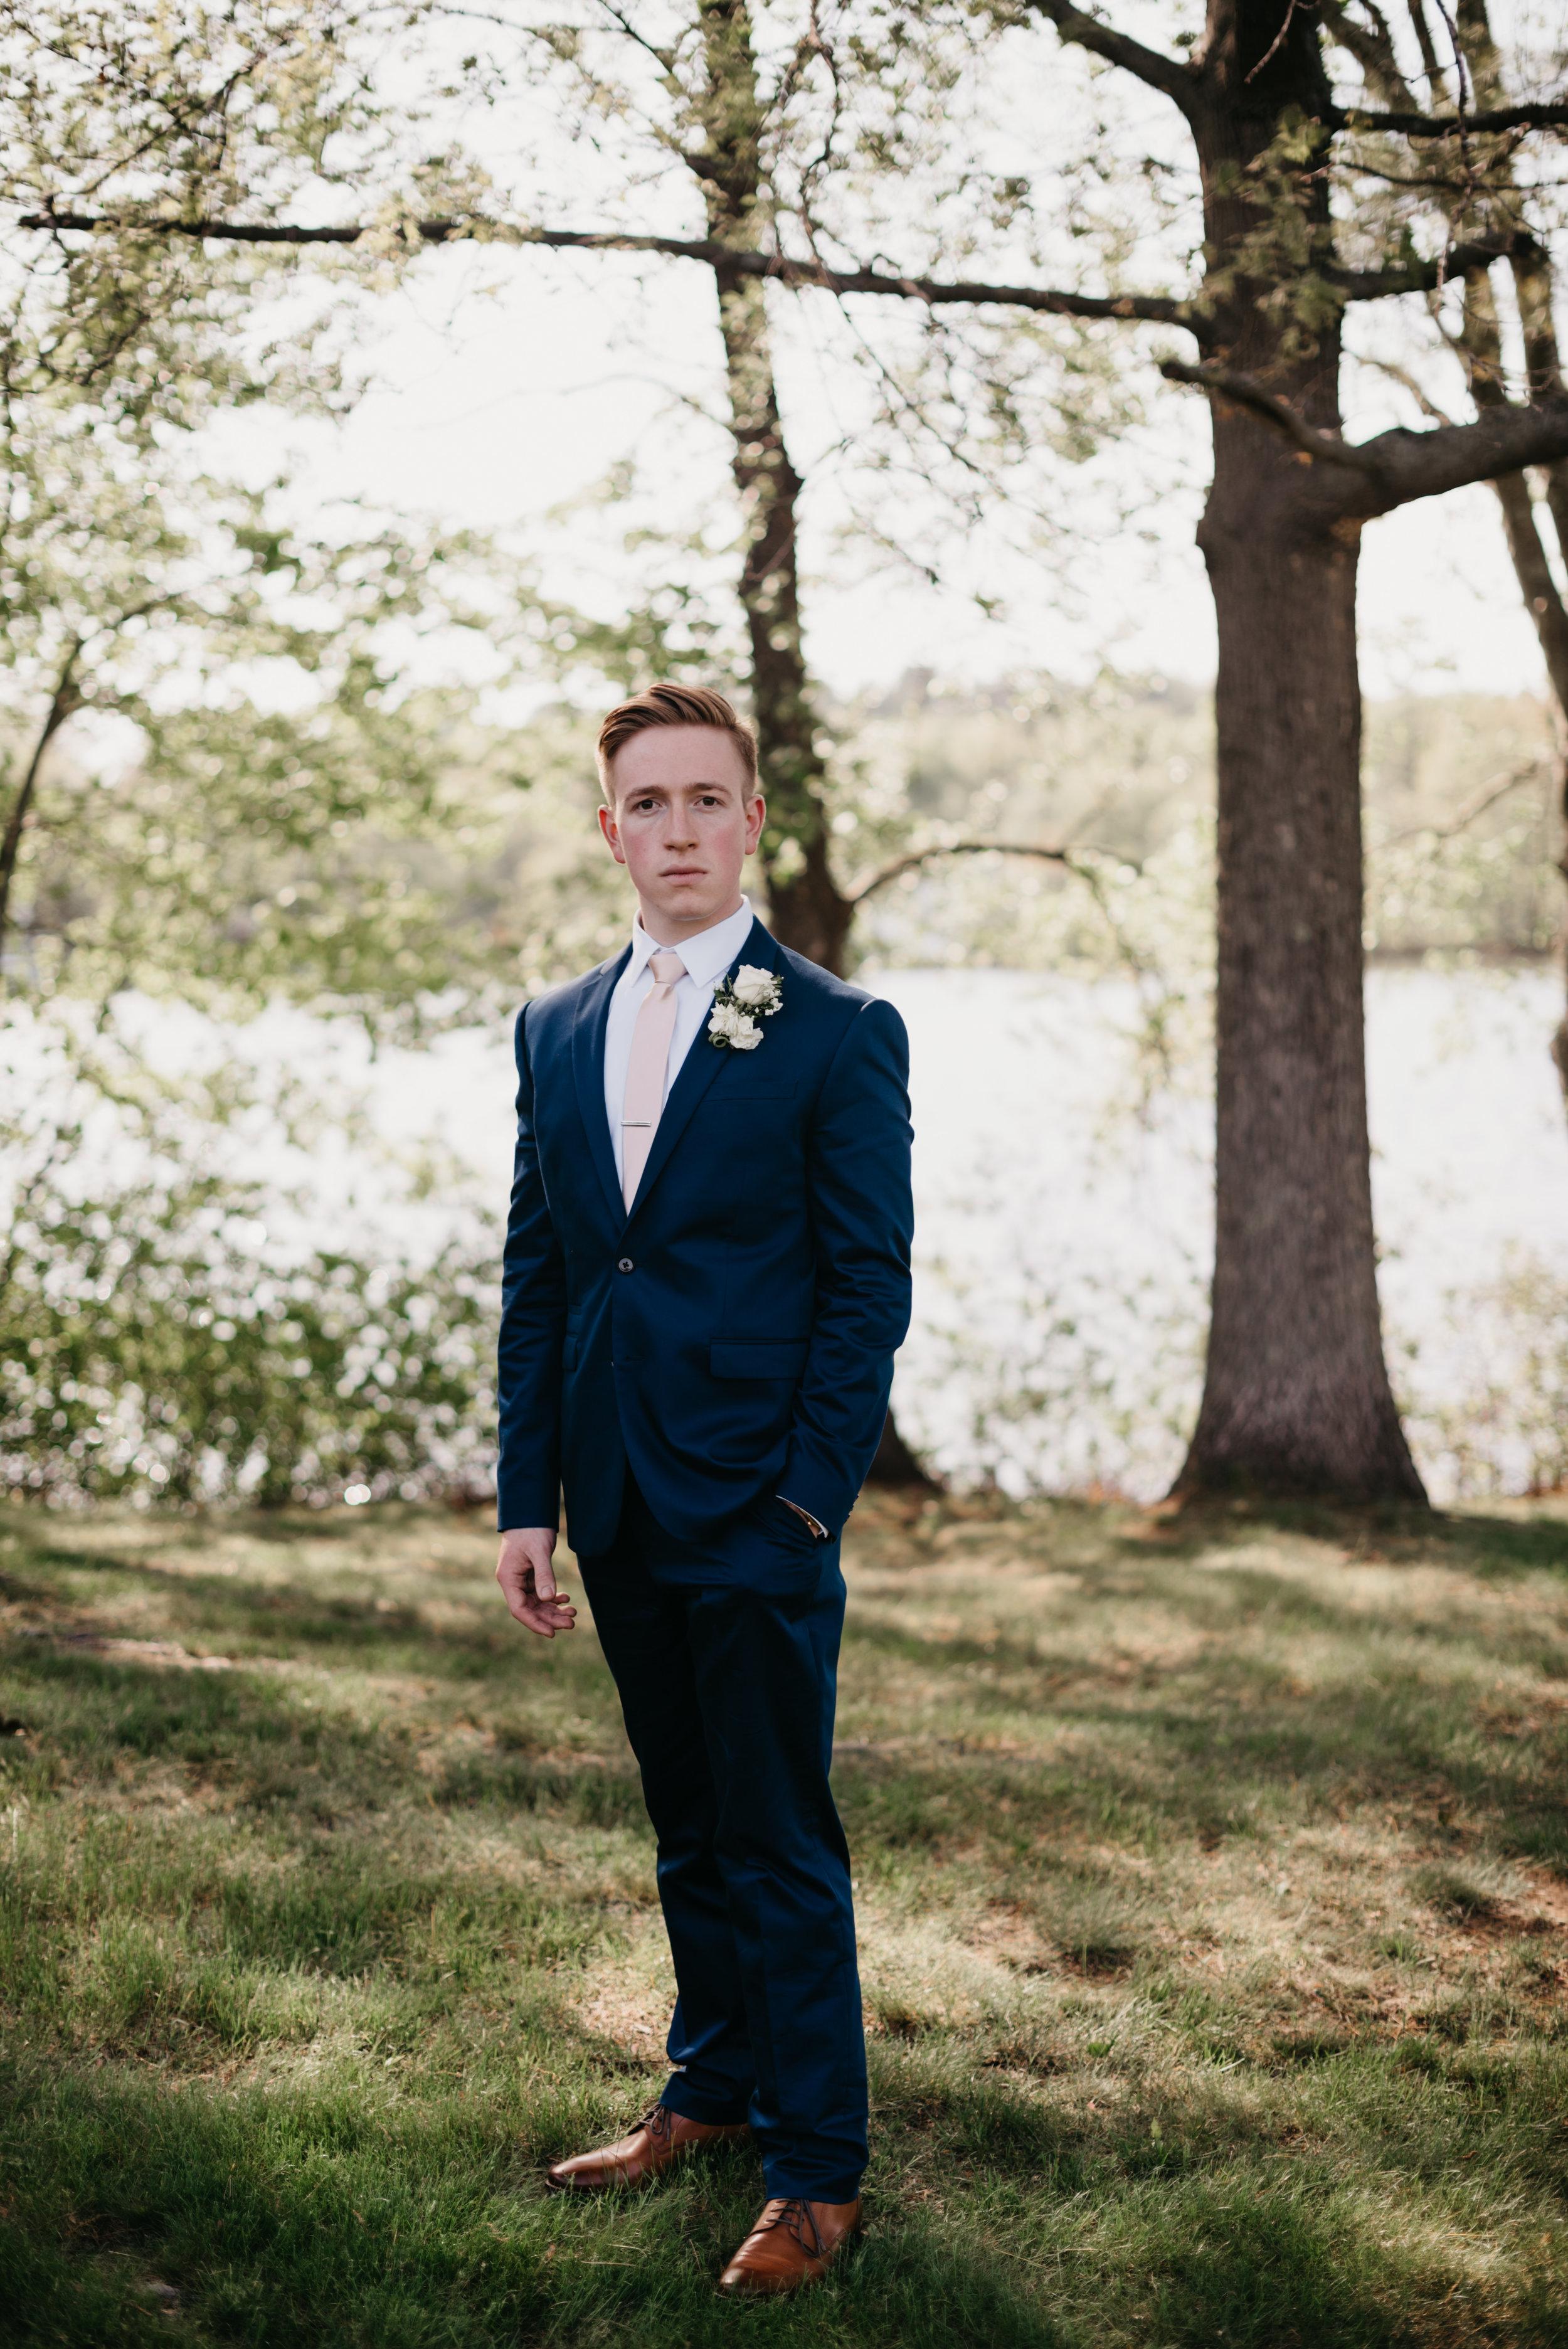 Barch-Massachusetts-Lakeside Tent Wedding-Western Massachusetts Wedding Photographer-01457.jpg